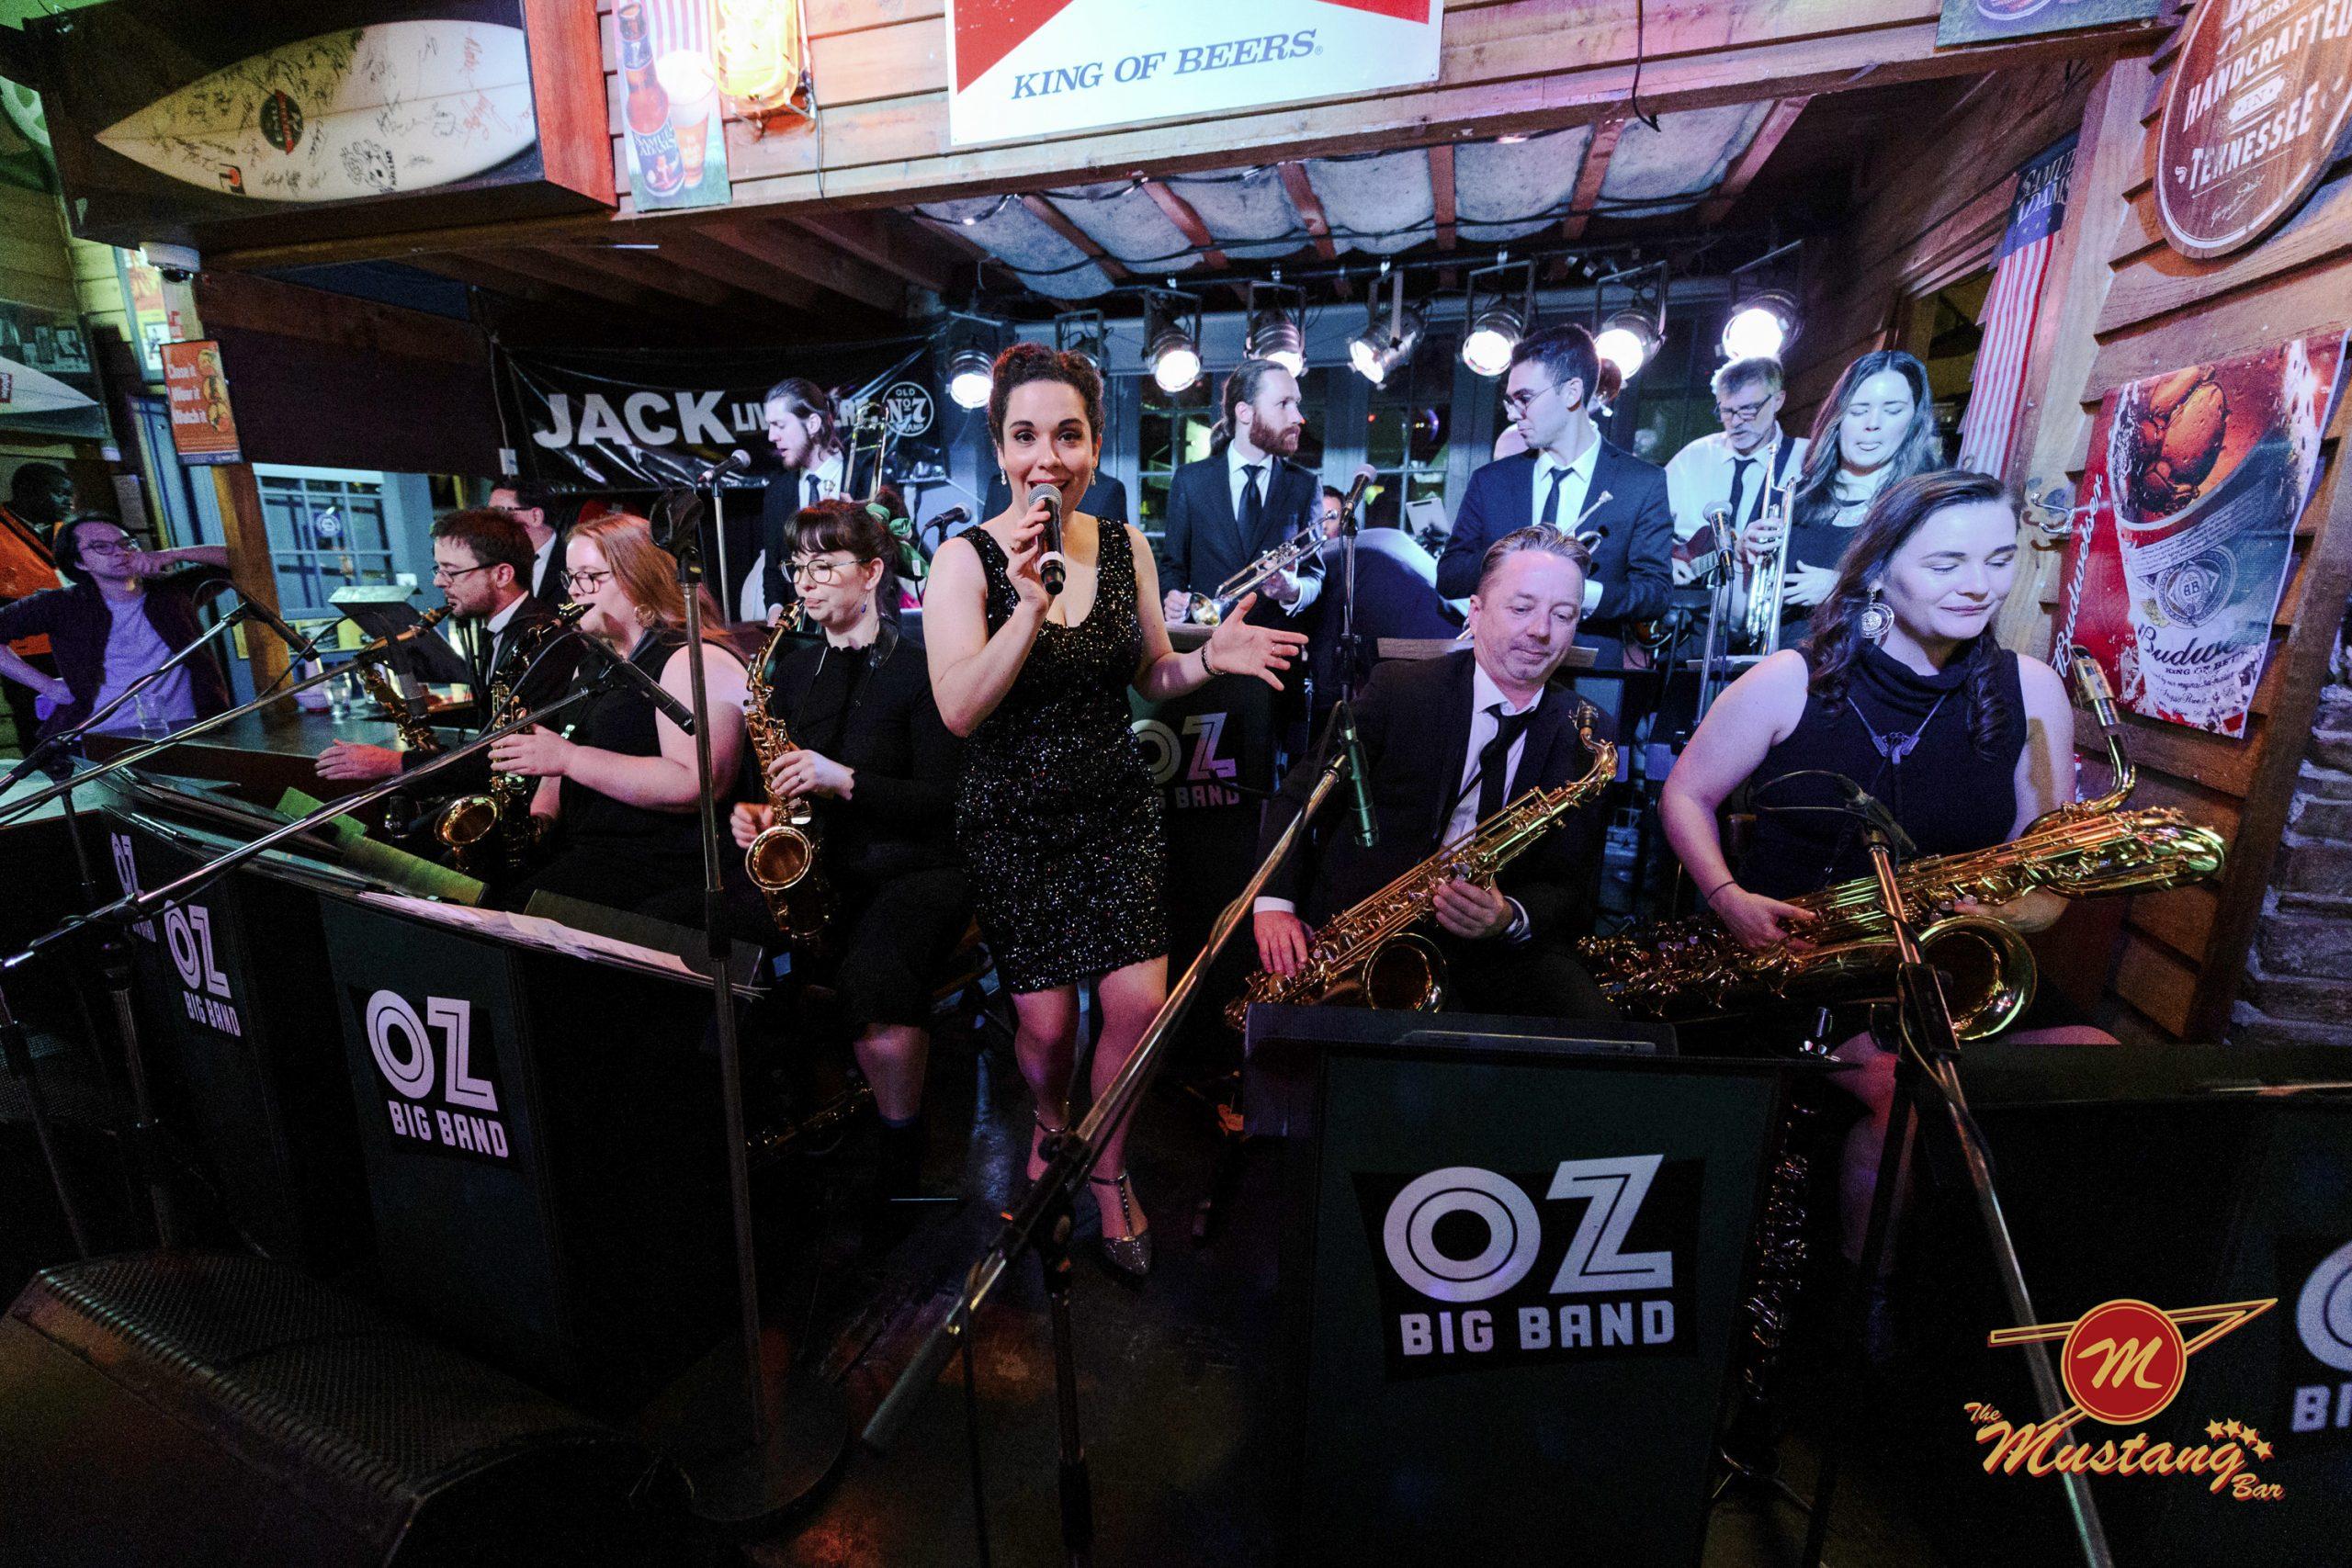 Oz Big Band + Flash Nat